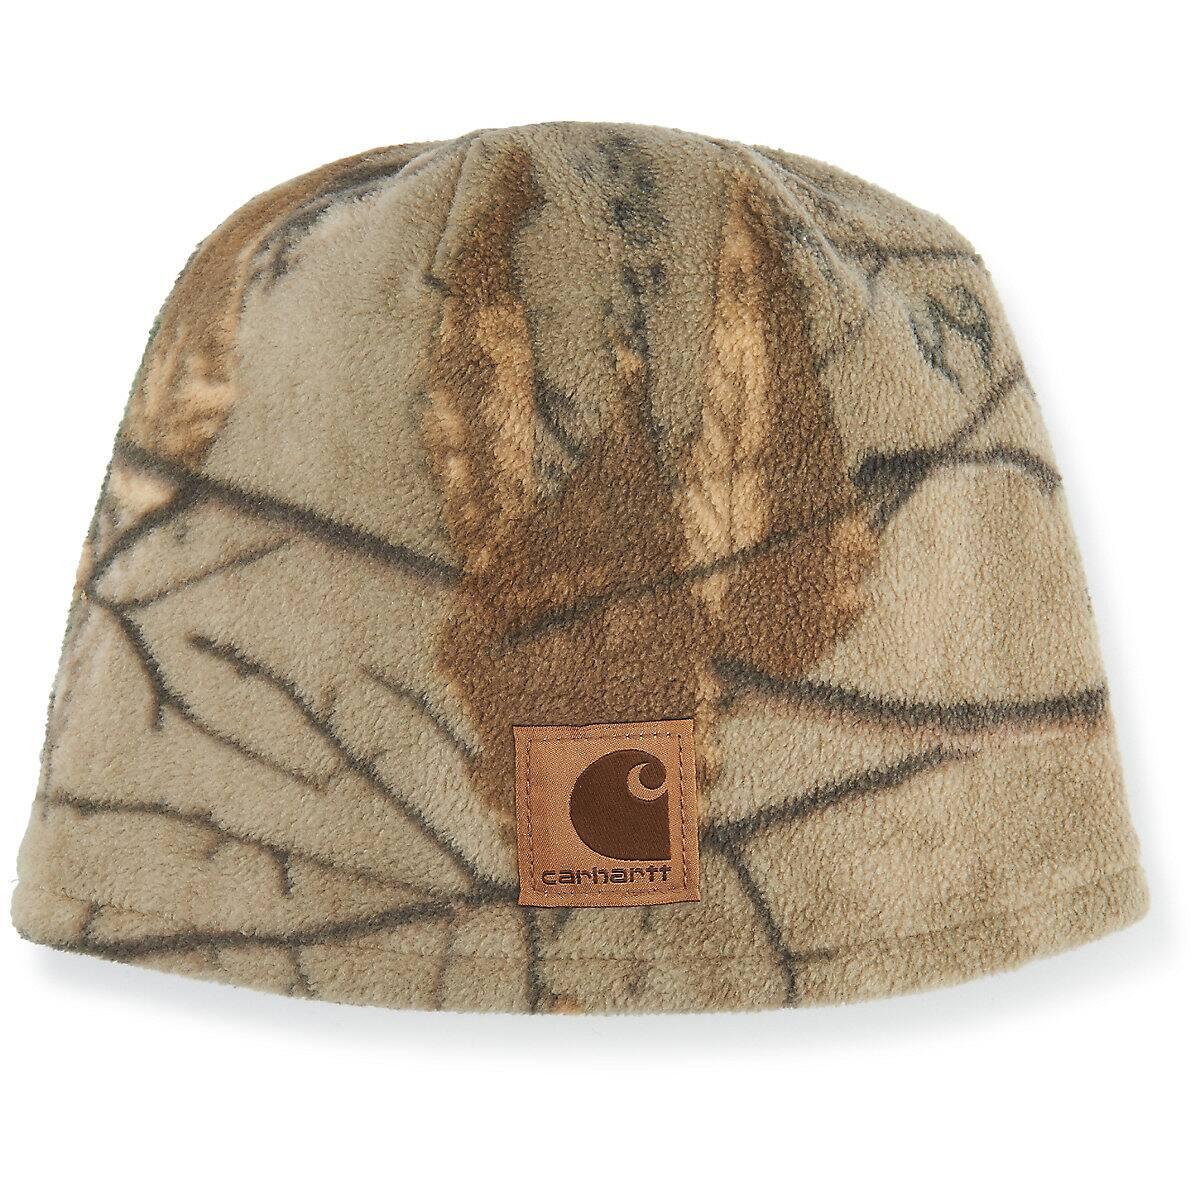 8b9530301dfb5 Unisex Carhartt Force® Realtree Xtra® Swifton Hat